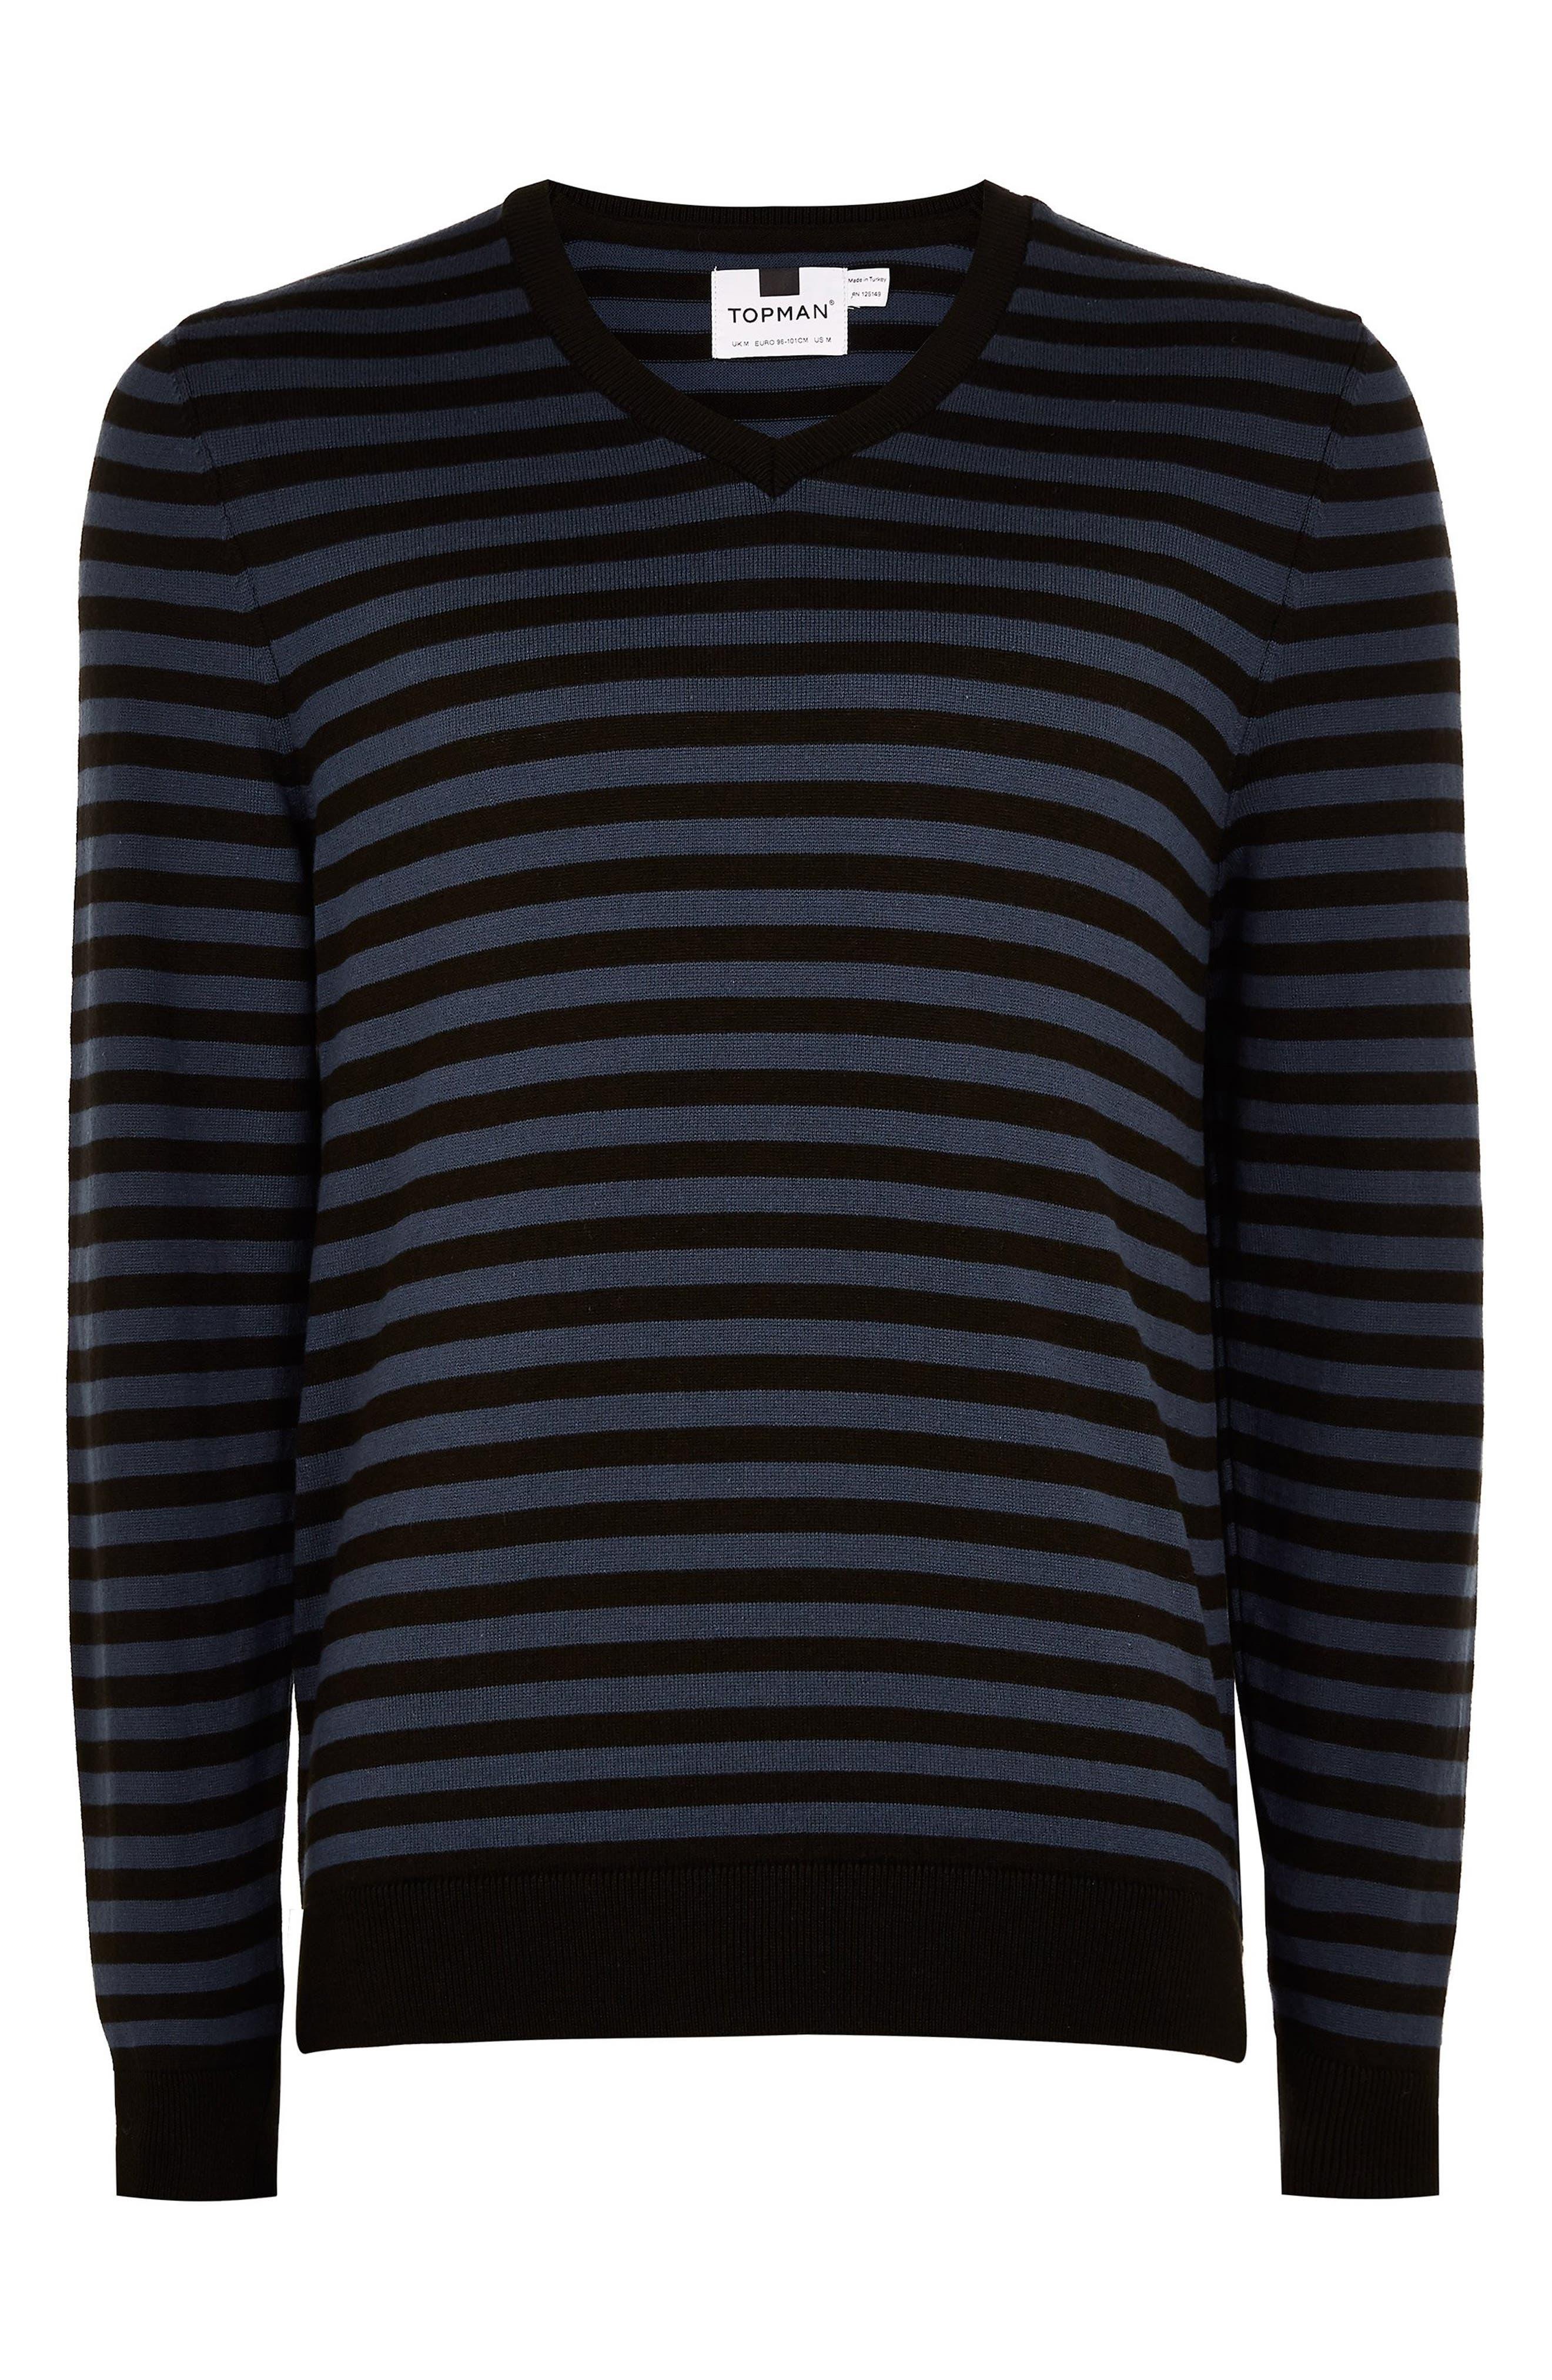 TOPMAN, Stripe V-Neck Sweater, Alternate thumbnail 3, color, BLUE MULTI